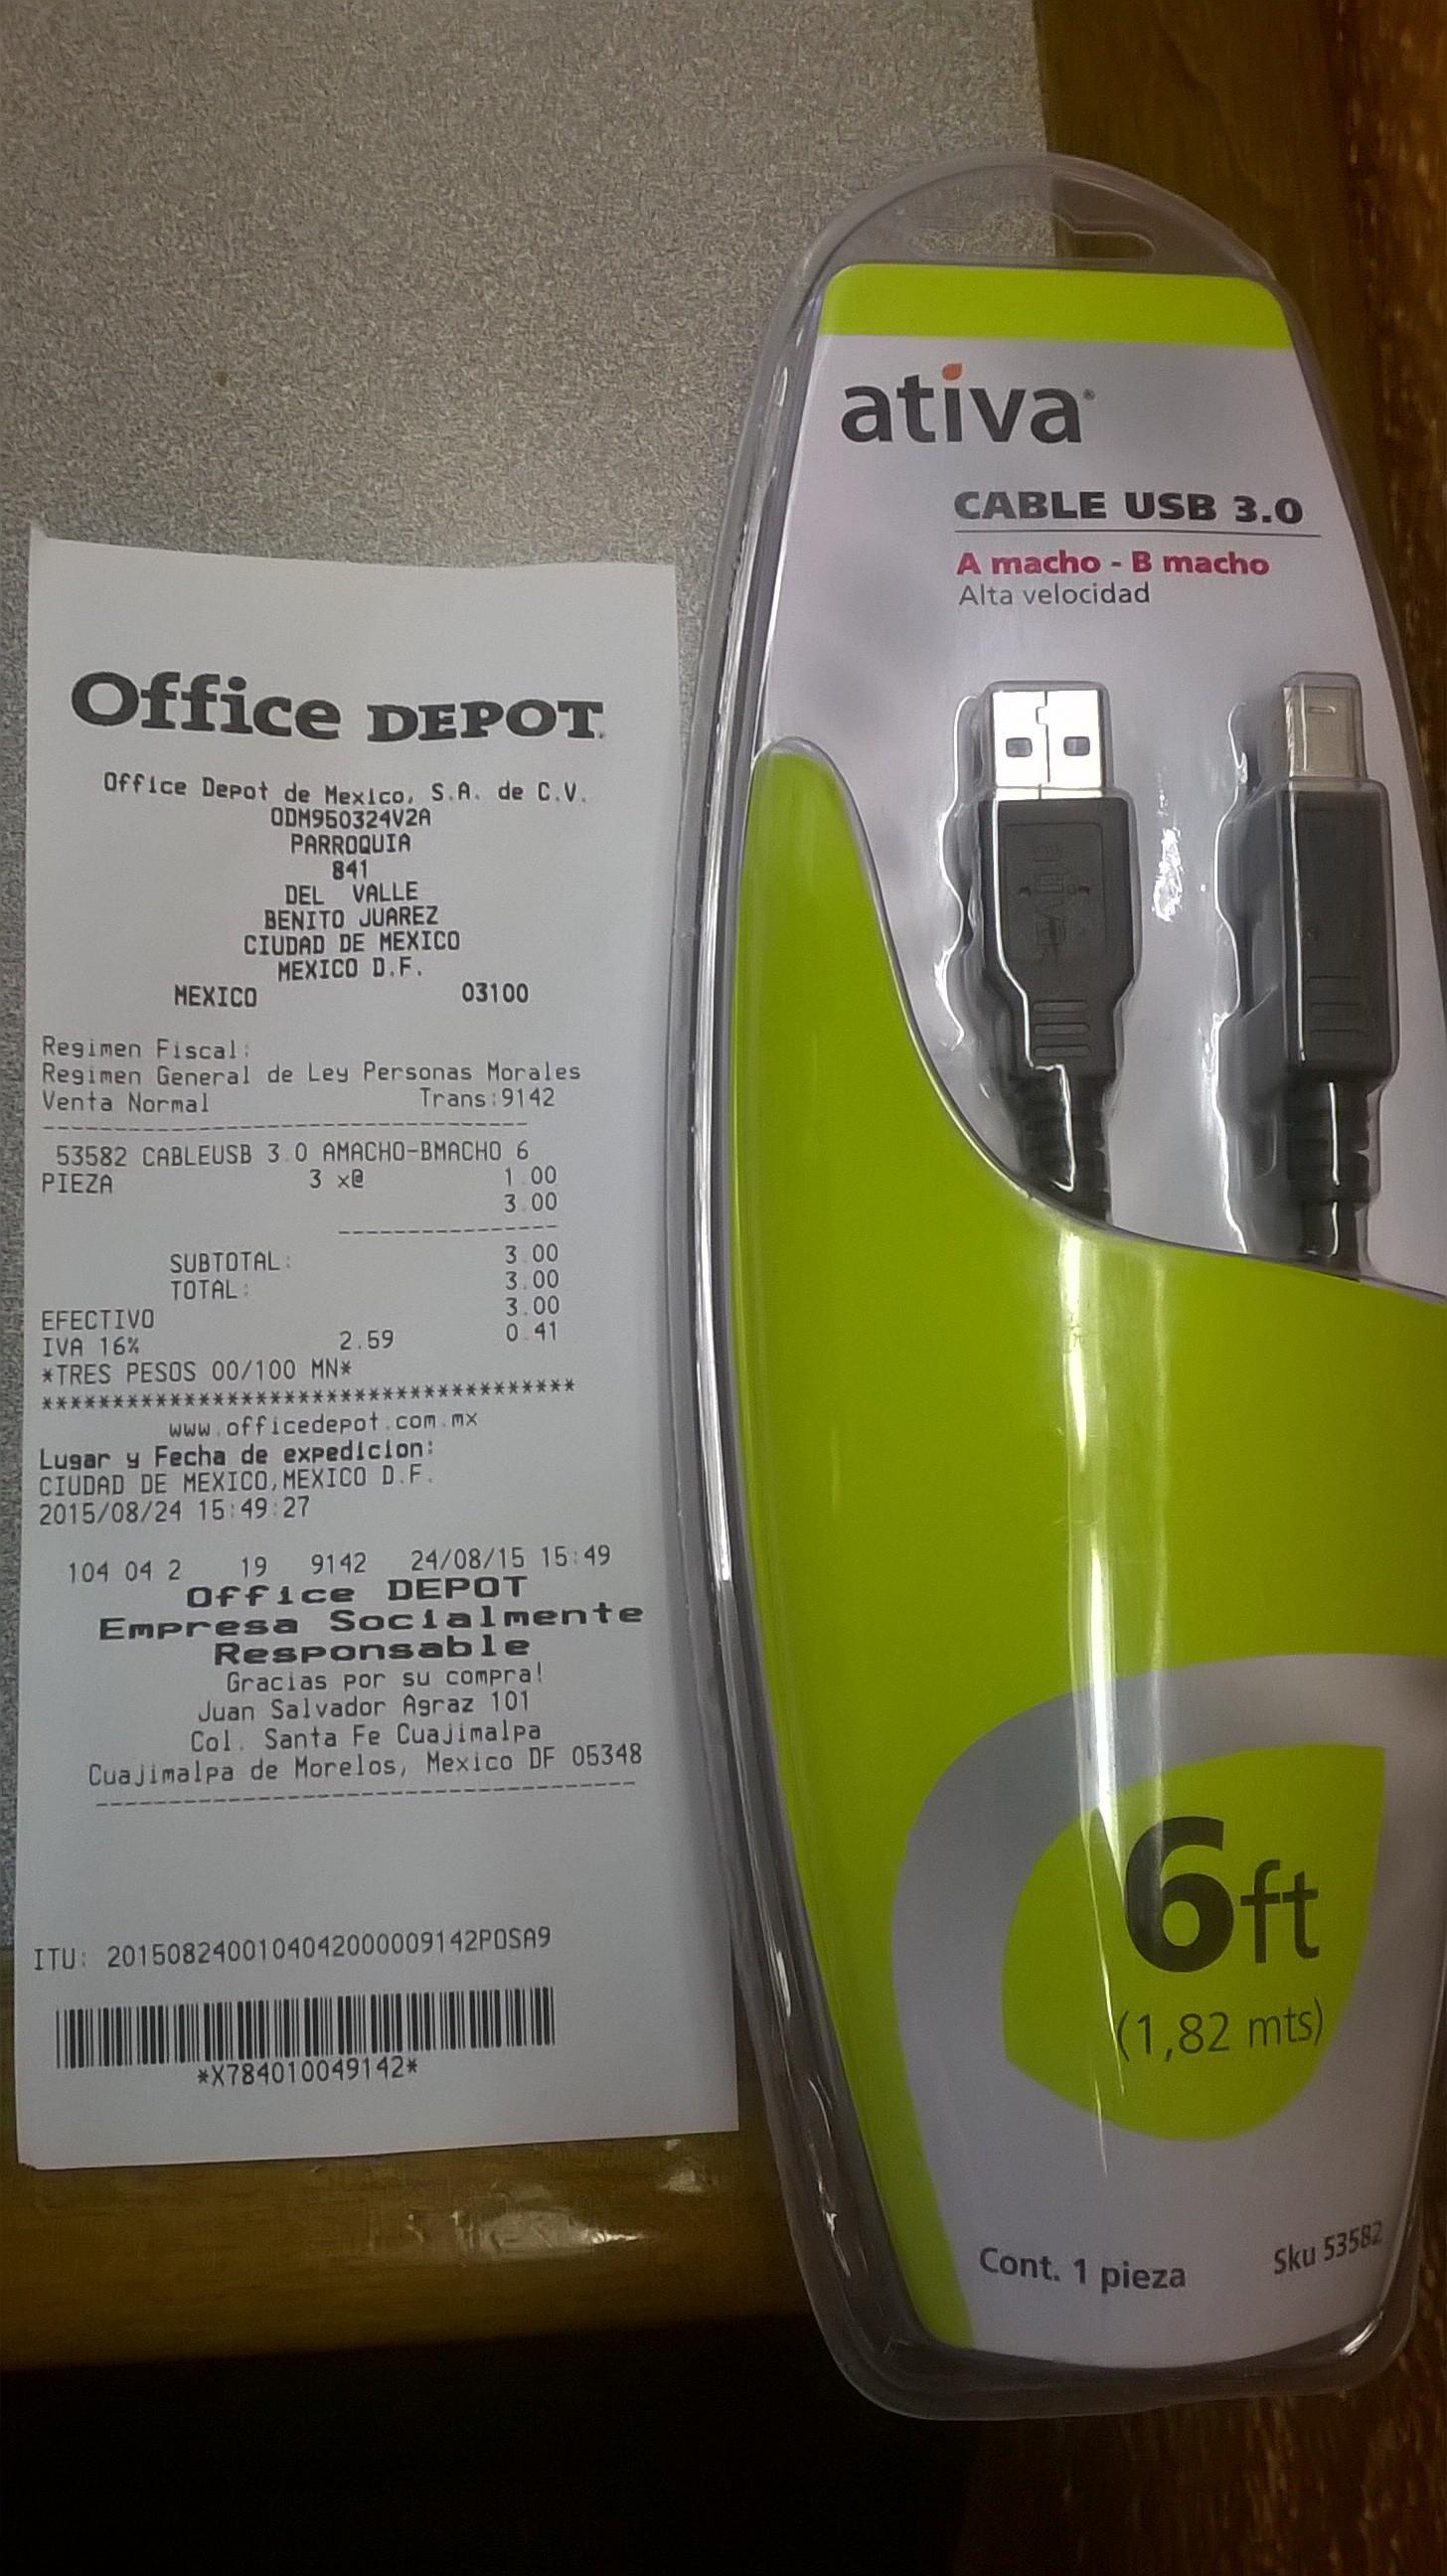 Office Depot: Cables USB 3.0, tipo macho A - macho B a $1